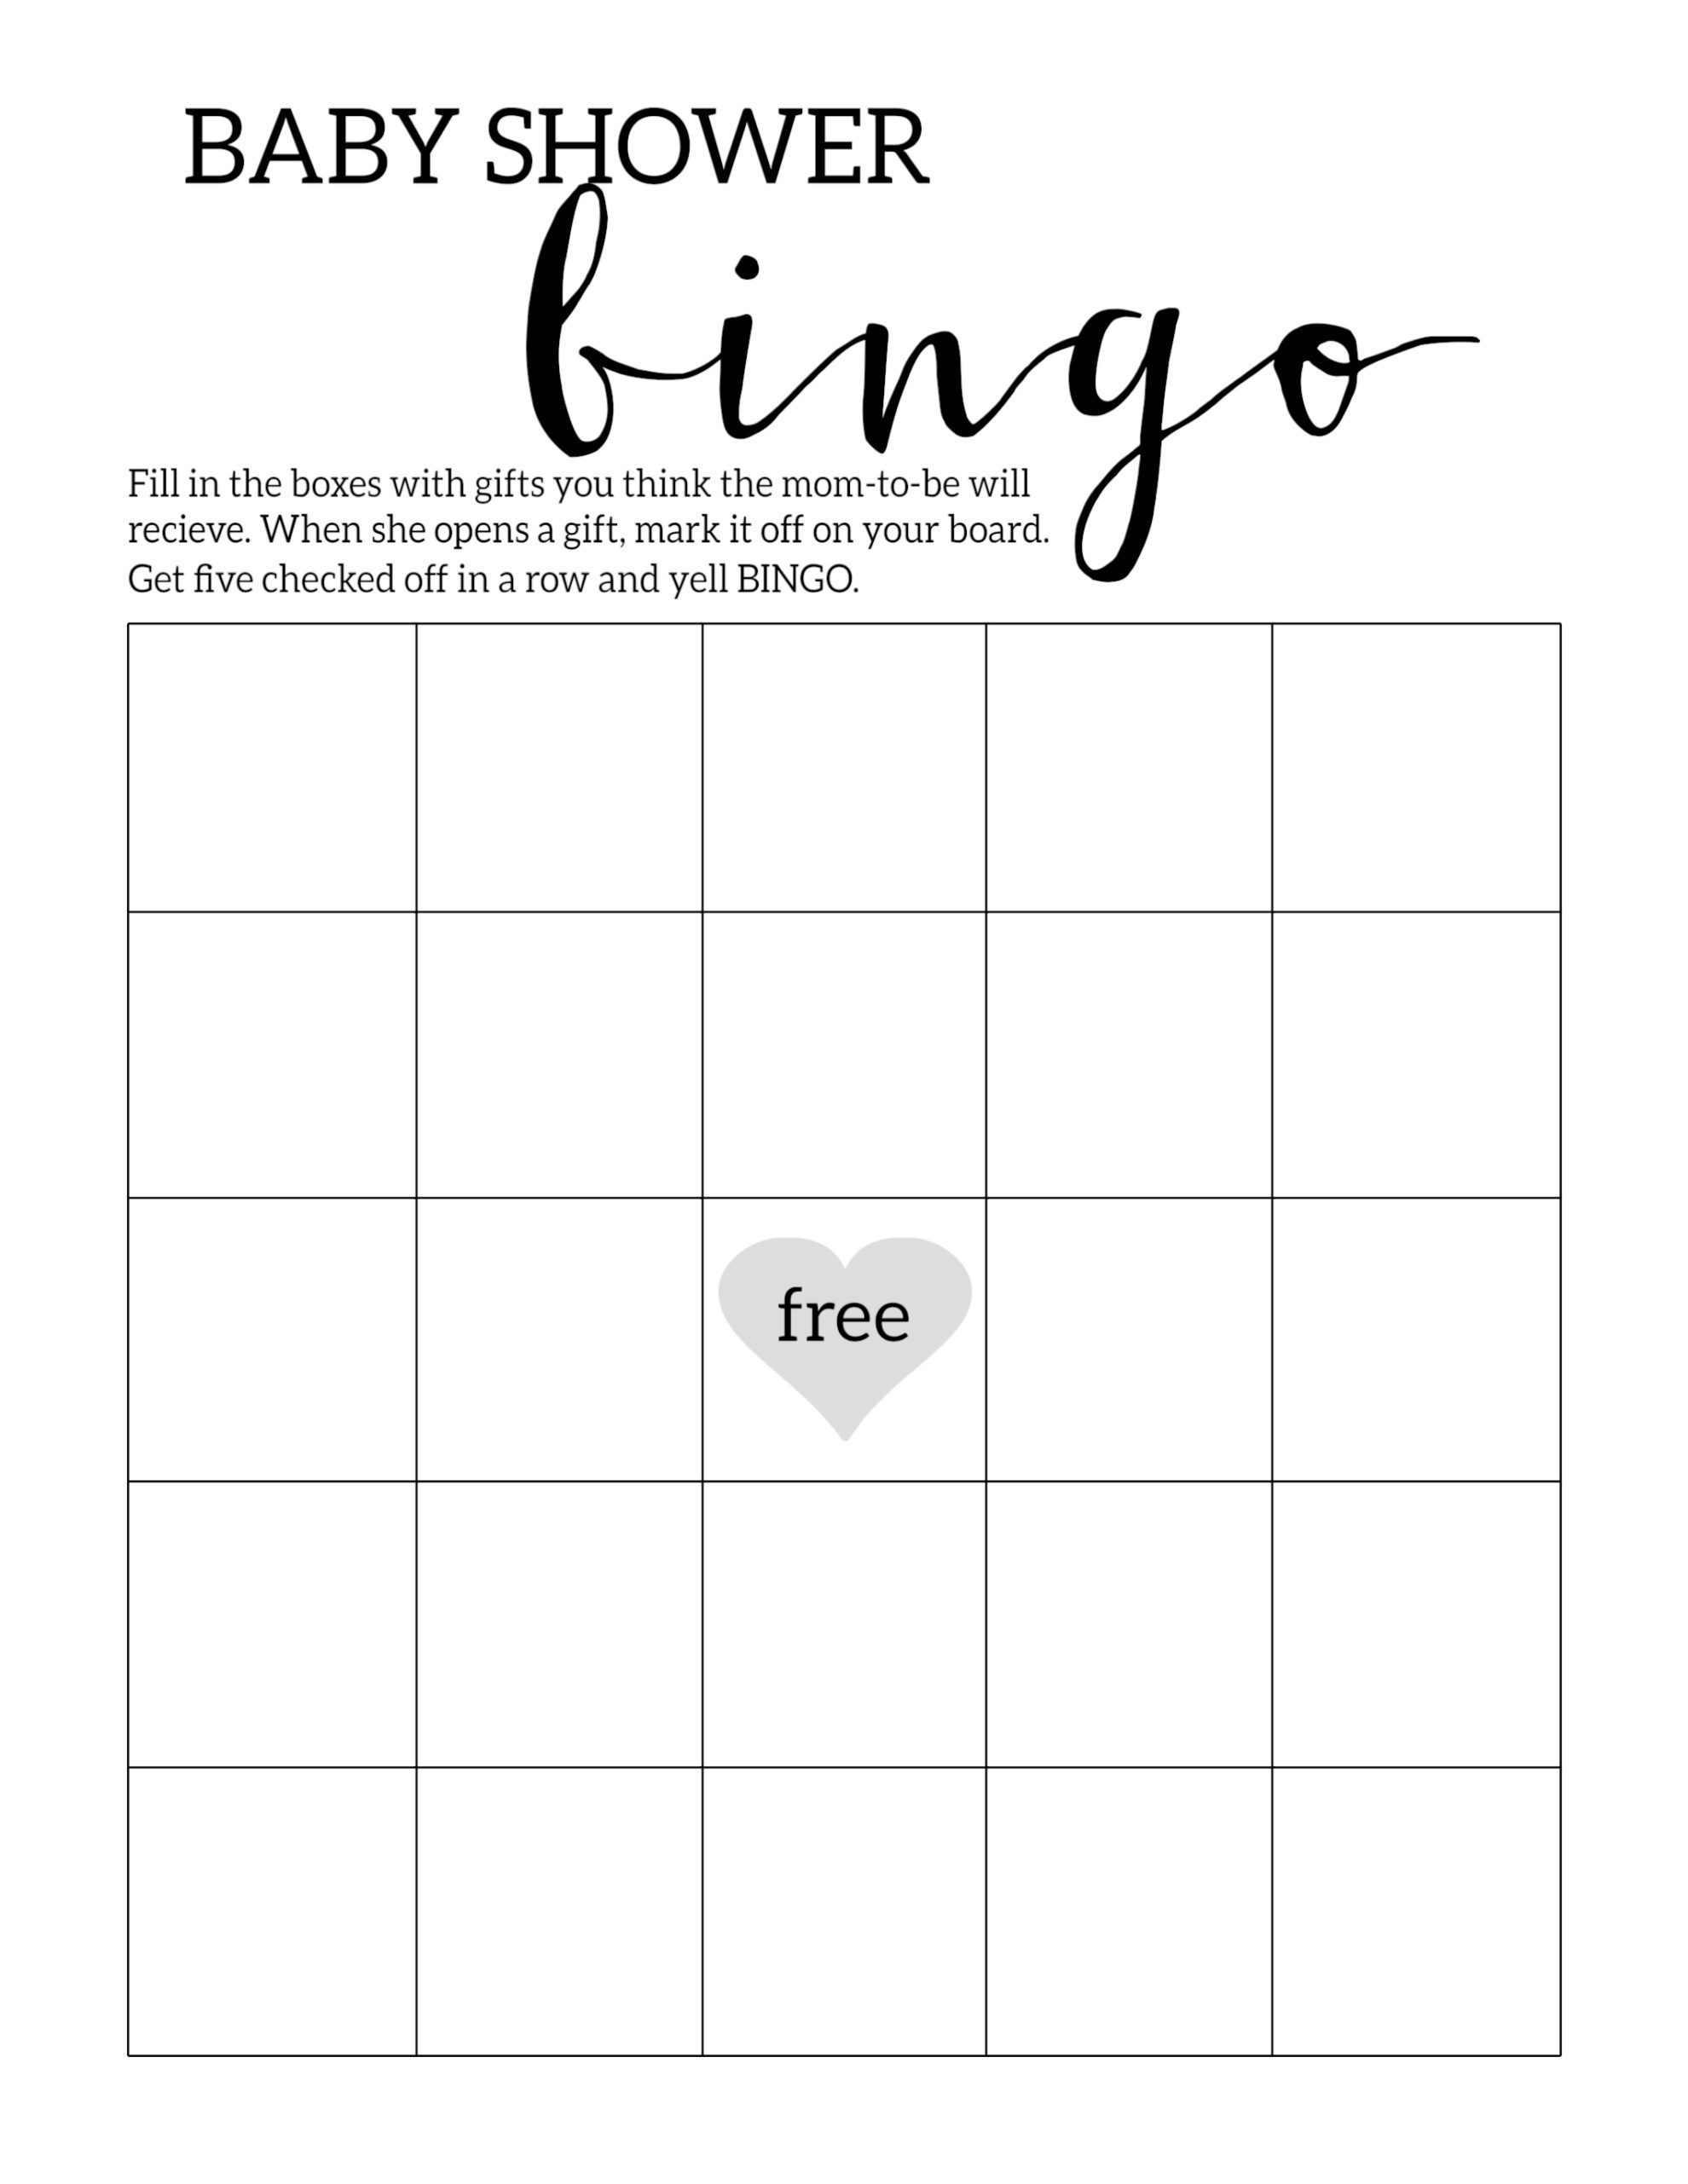 Baby Shower Bingo Printable Cards Template - Paper Trail Design - Bingo Generator Free Printable